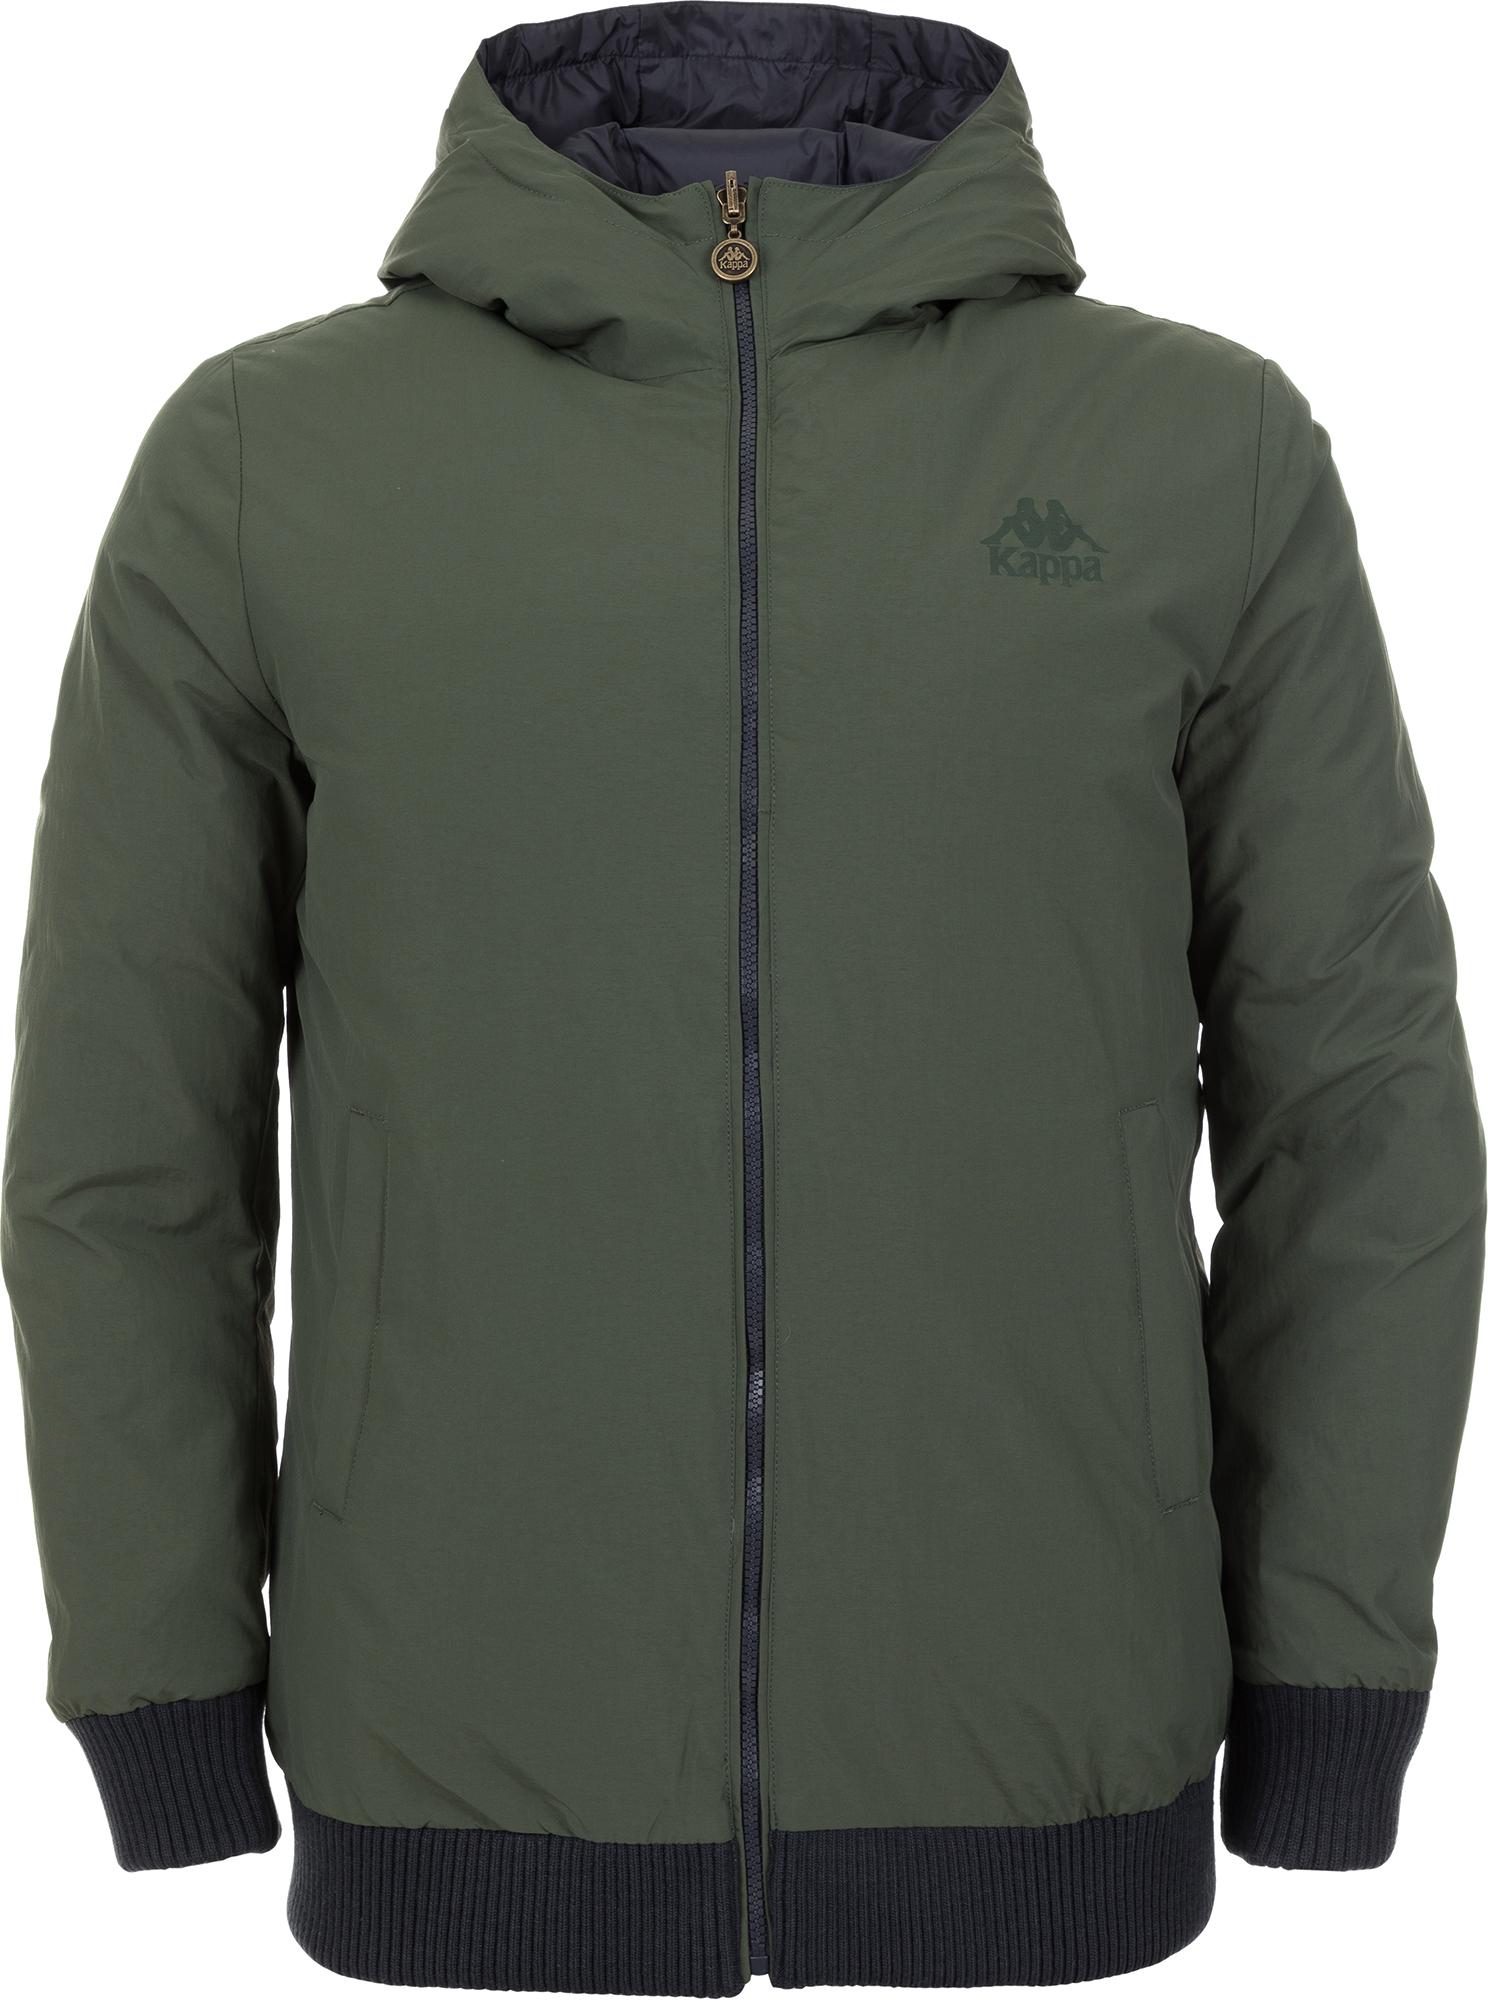 Kappa Куртка утепленная мужская Kappa, размер 52 куртка двусторонняя lily thermo